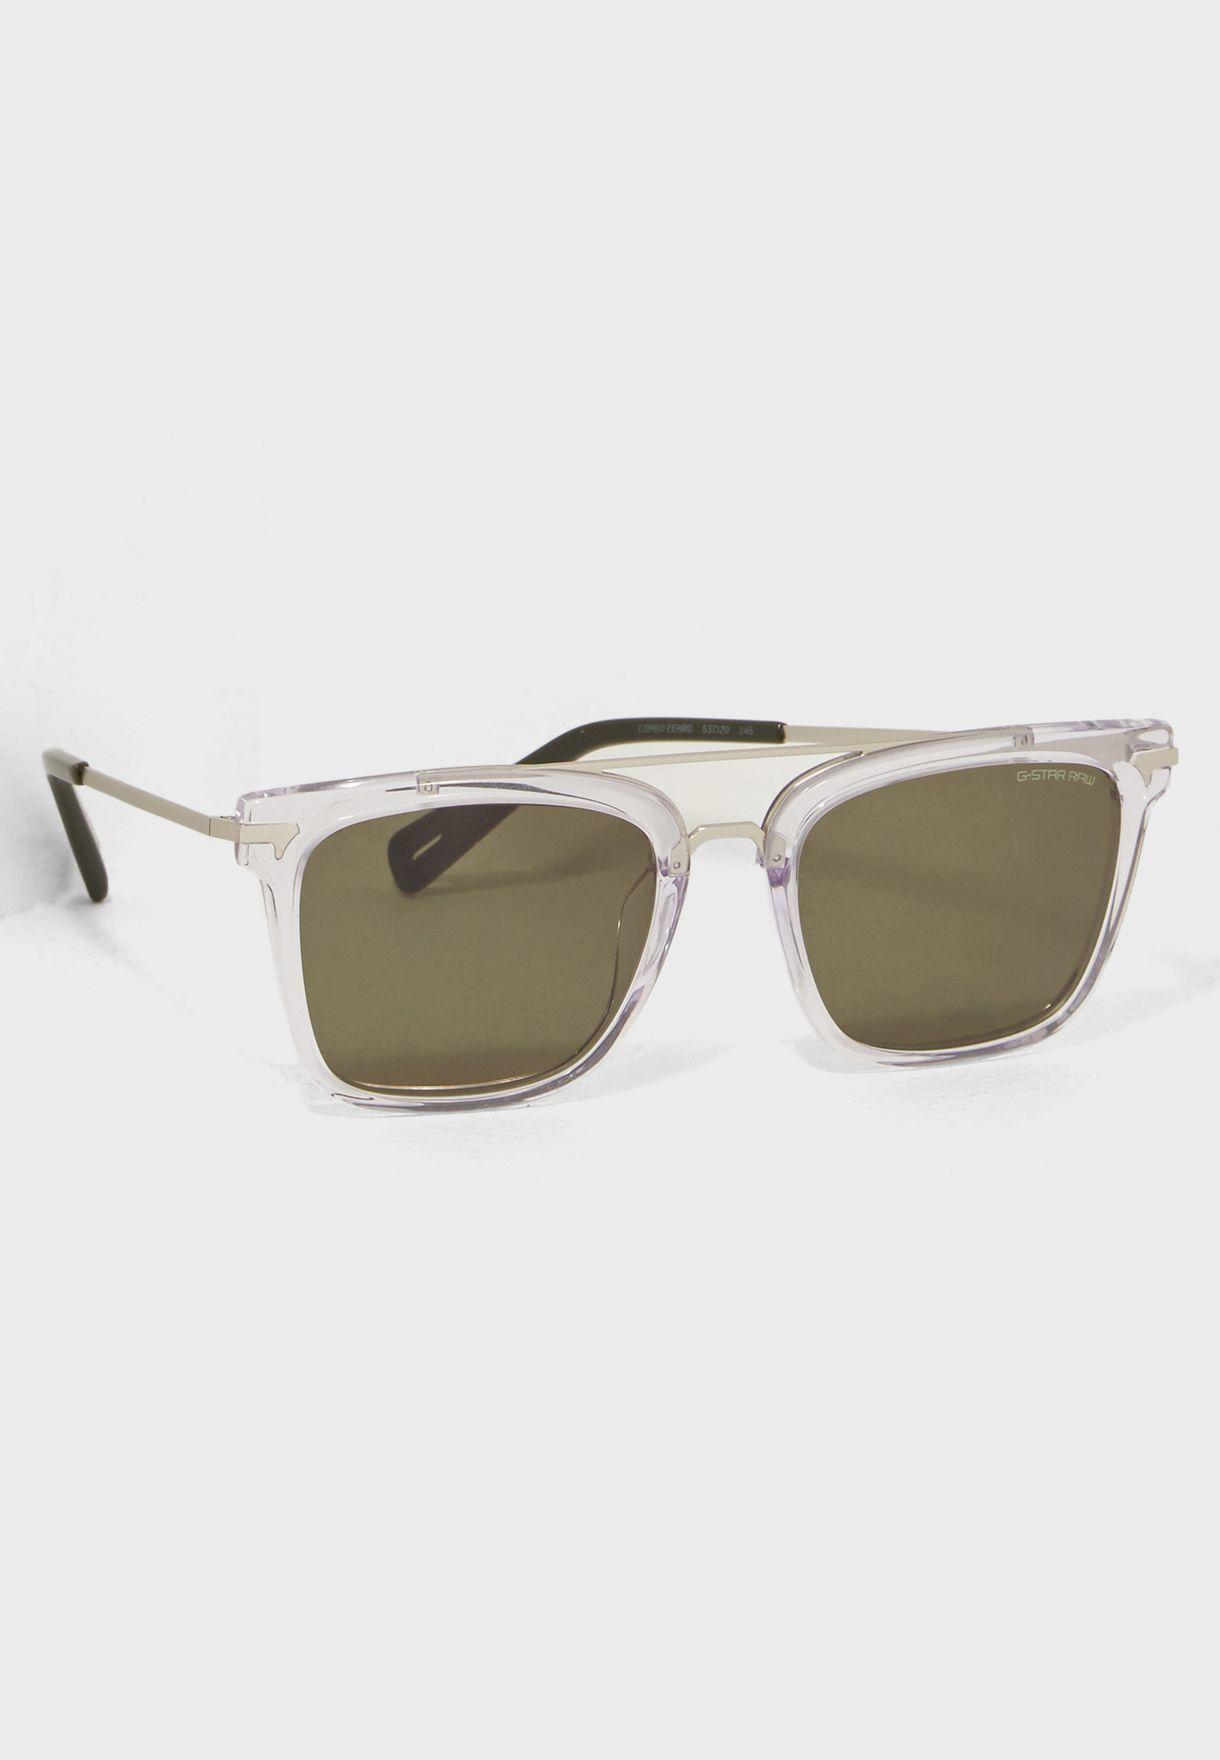 0d3d3d05648 Shop Gstar grey Eehro Sunglasses GS661S COMBO EEHRO for Men in Saudi -  GS327AC06LHH